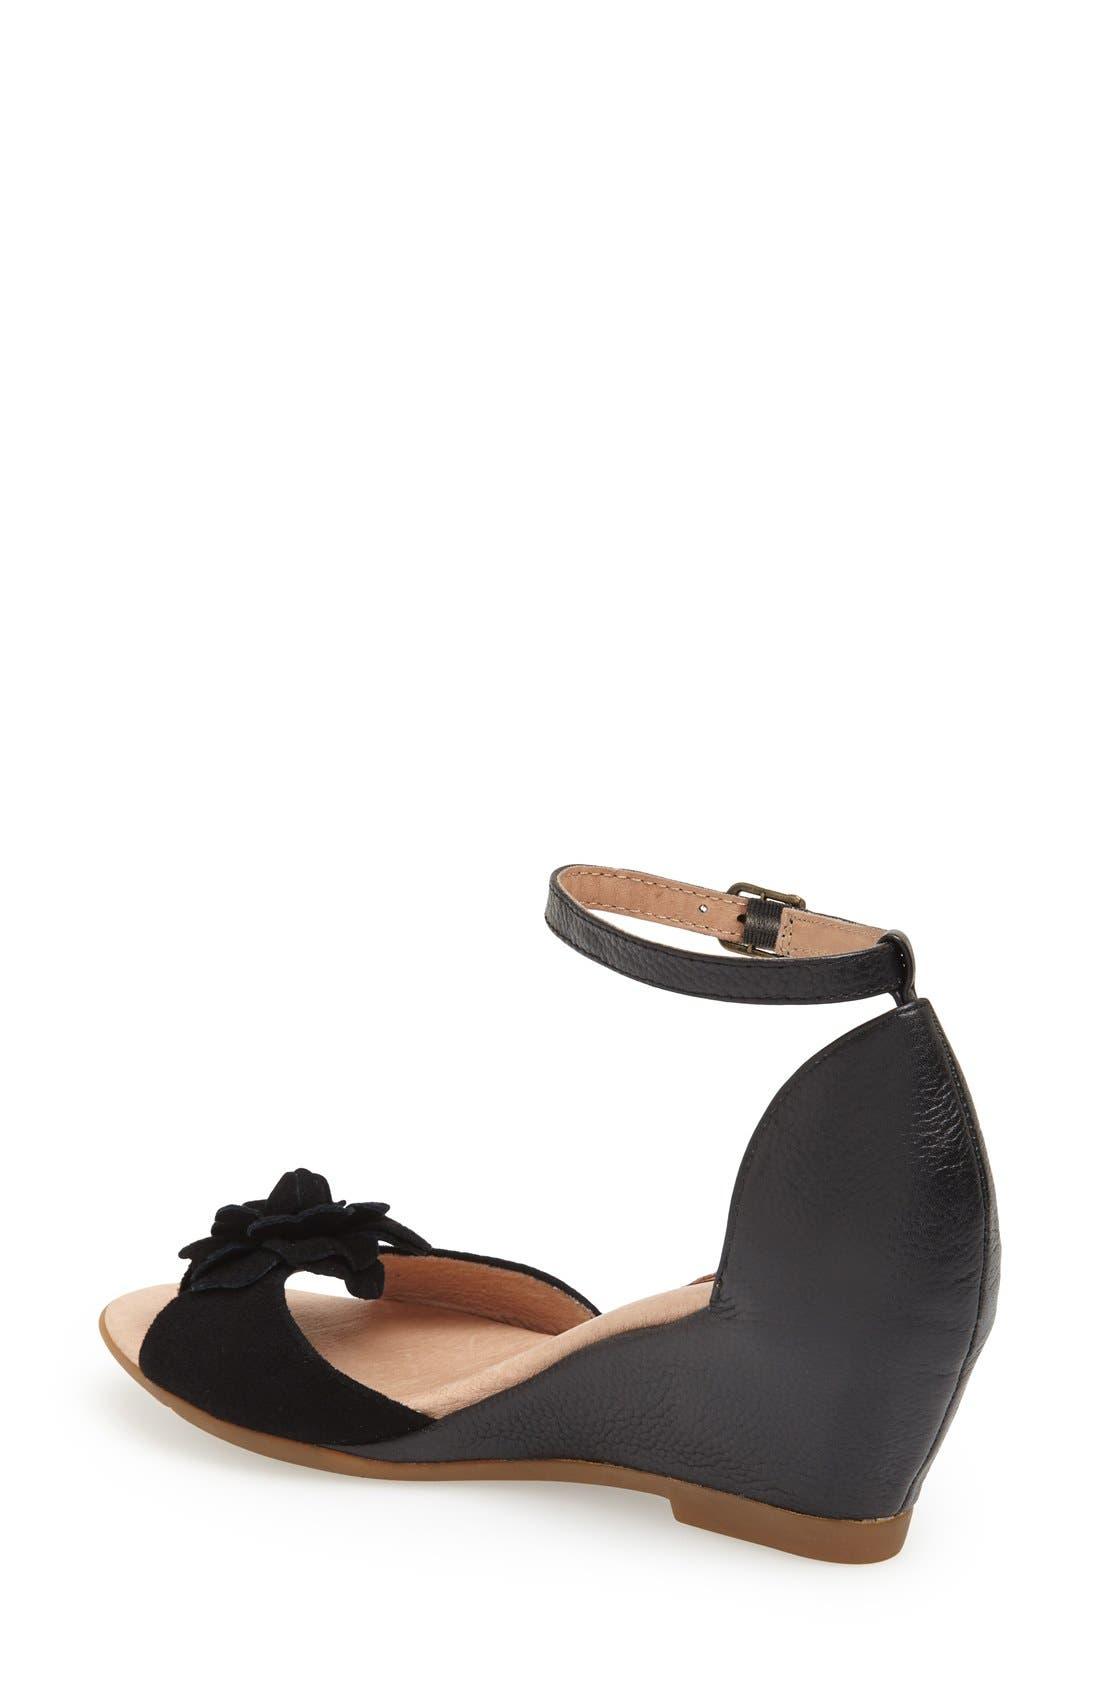 Alternate Image 2  - Miz Mooz 'Carmen' Leather Wedge Sandal (Women)(Special Purchase)